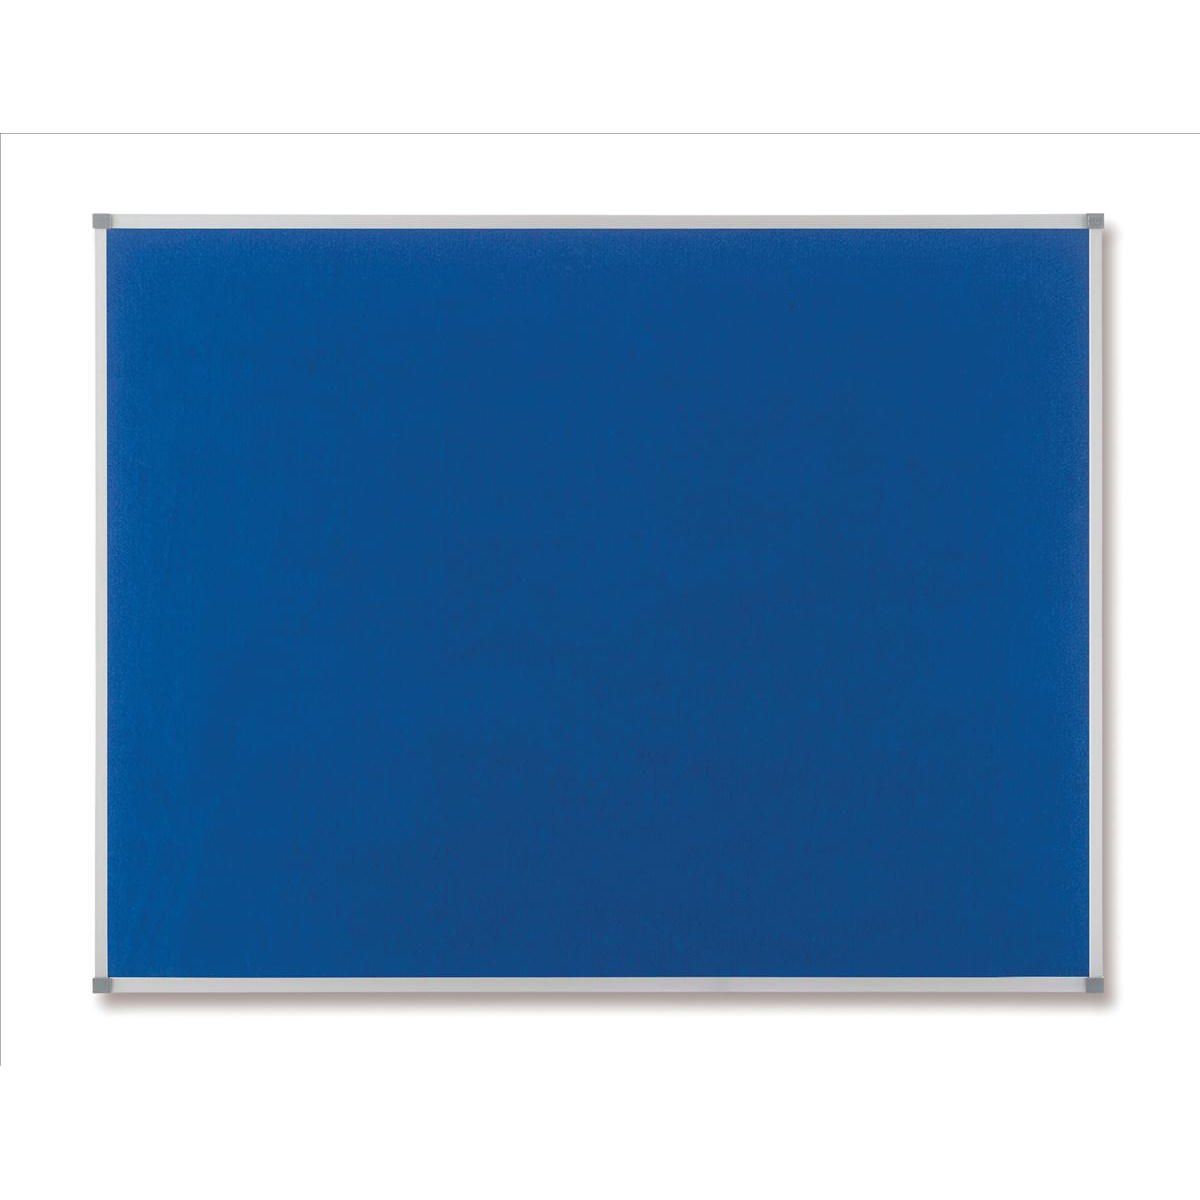 Nobo Classic Noticeboard Felt with Aluminium Frame W900xH600mm Blue Ref 1900915